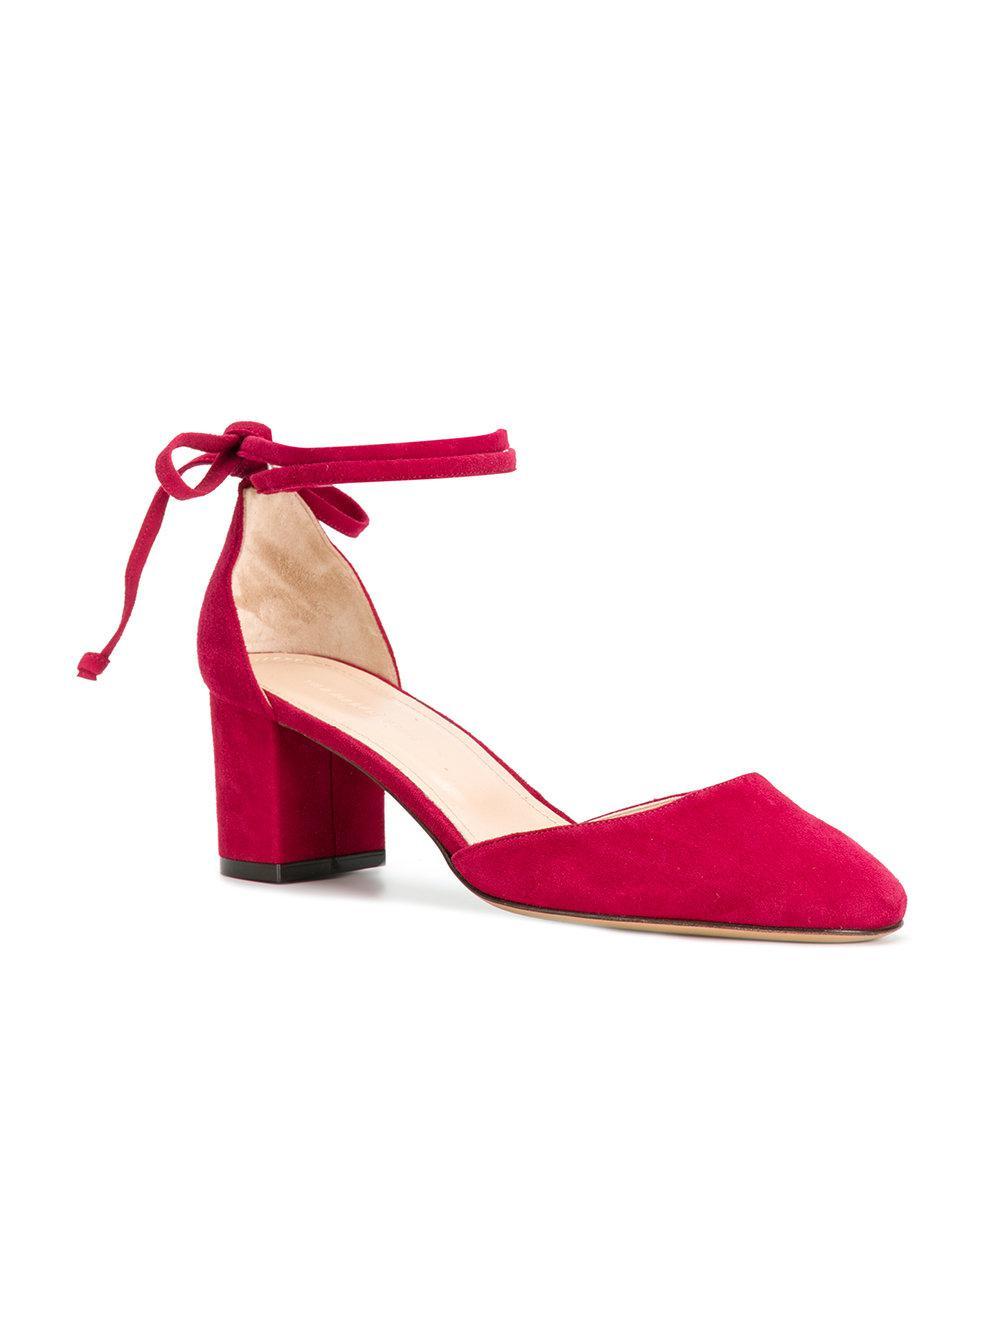 da63dbec4 Lyst - Tila March Ankle Tie Sandals in Pink